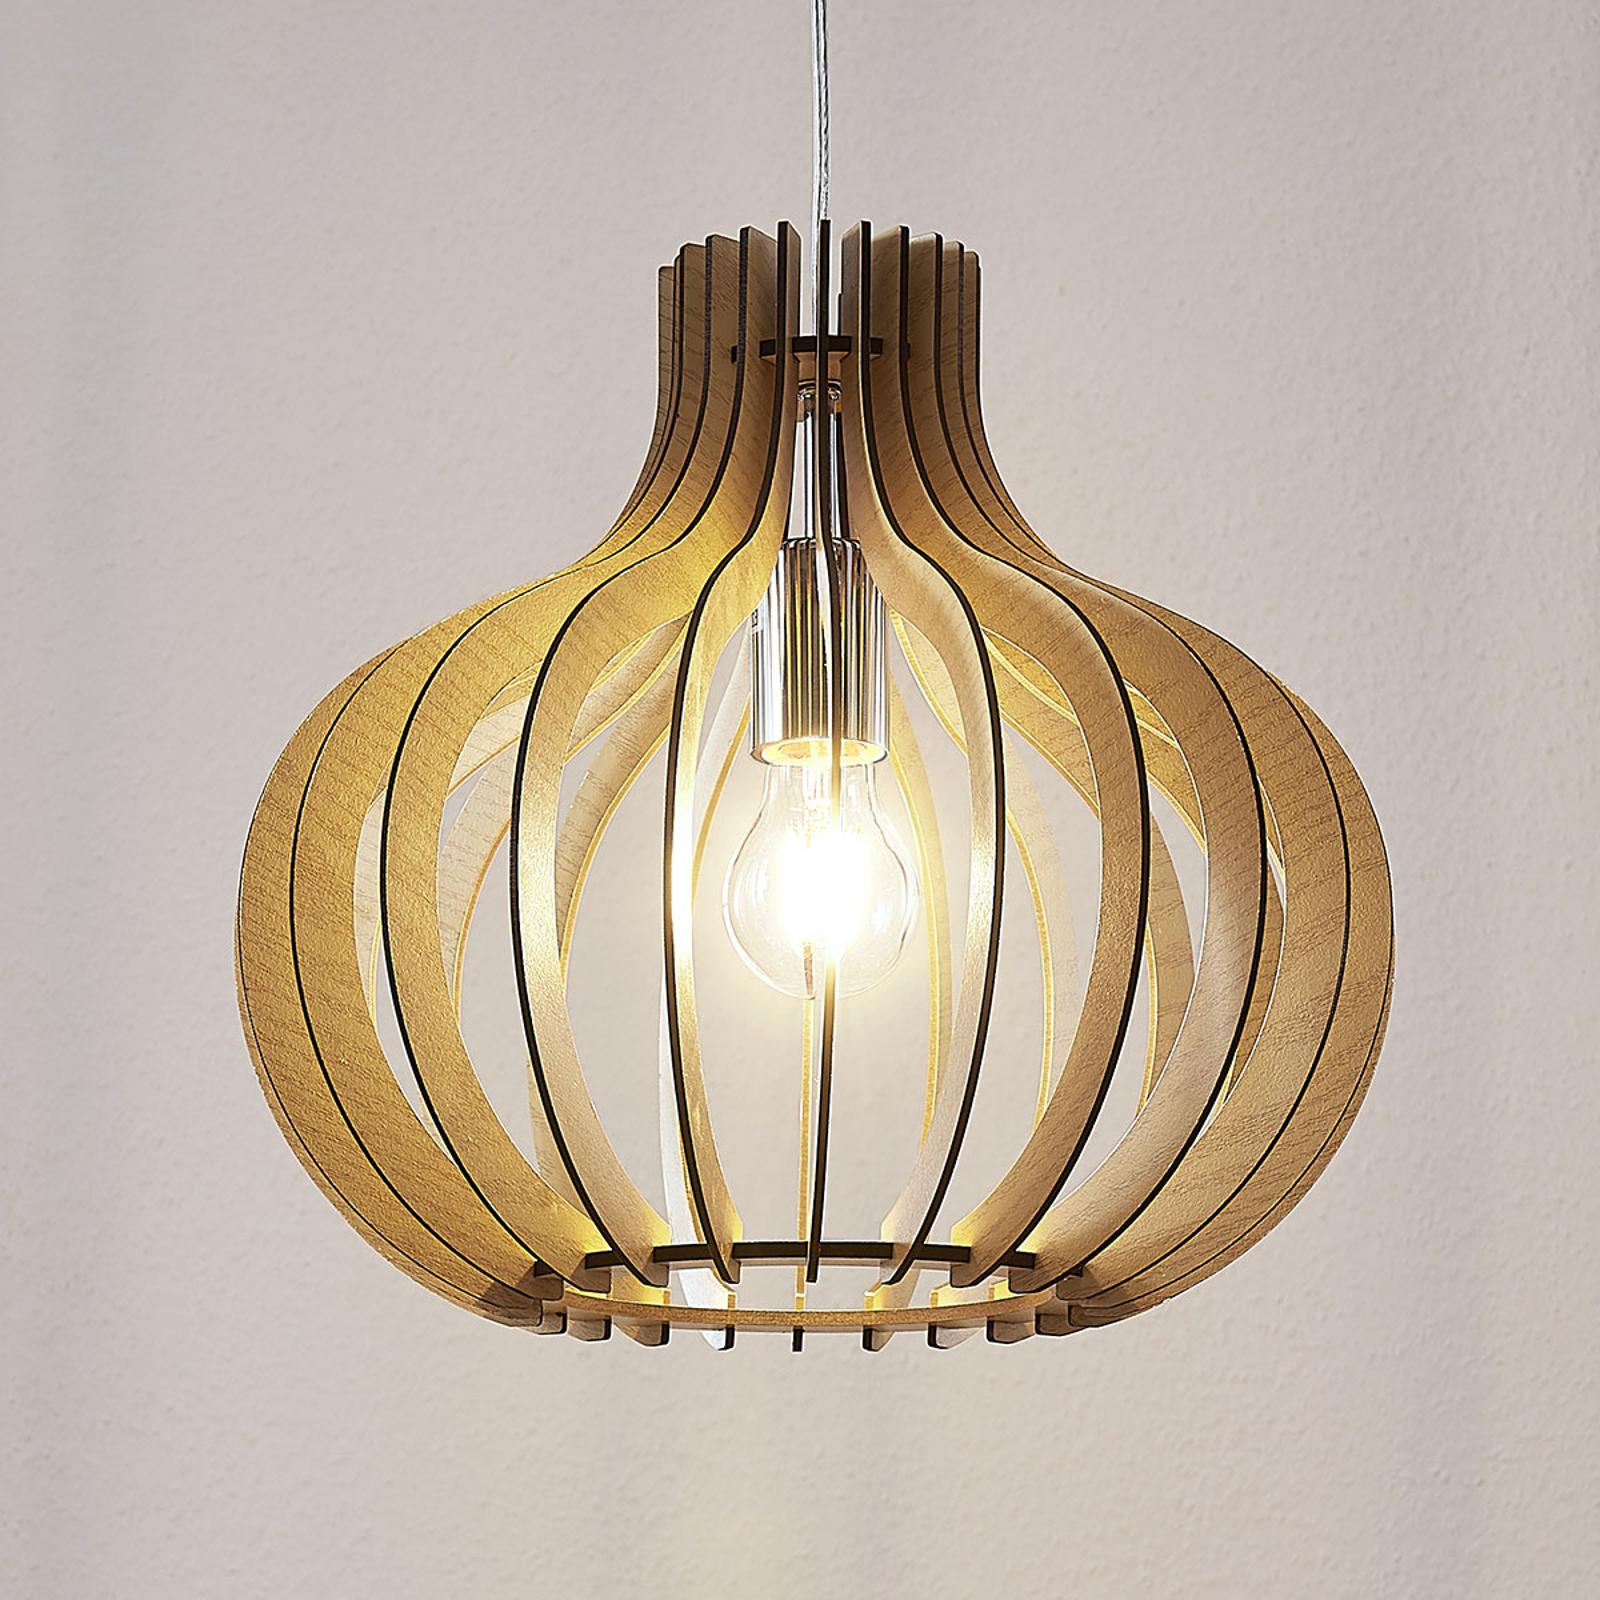 Ballonformet træ-pendellampe Sina, lys